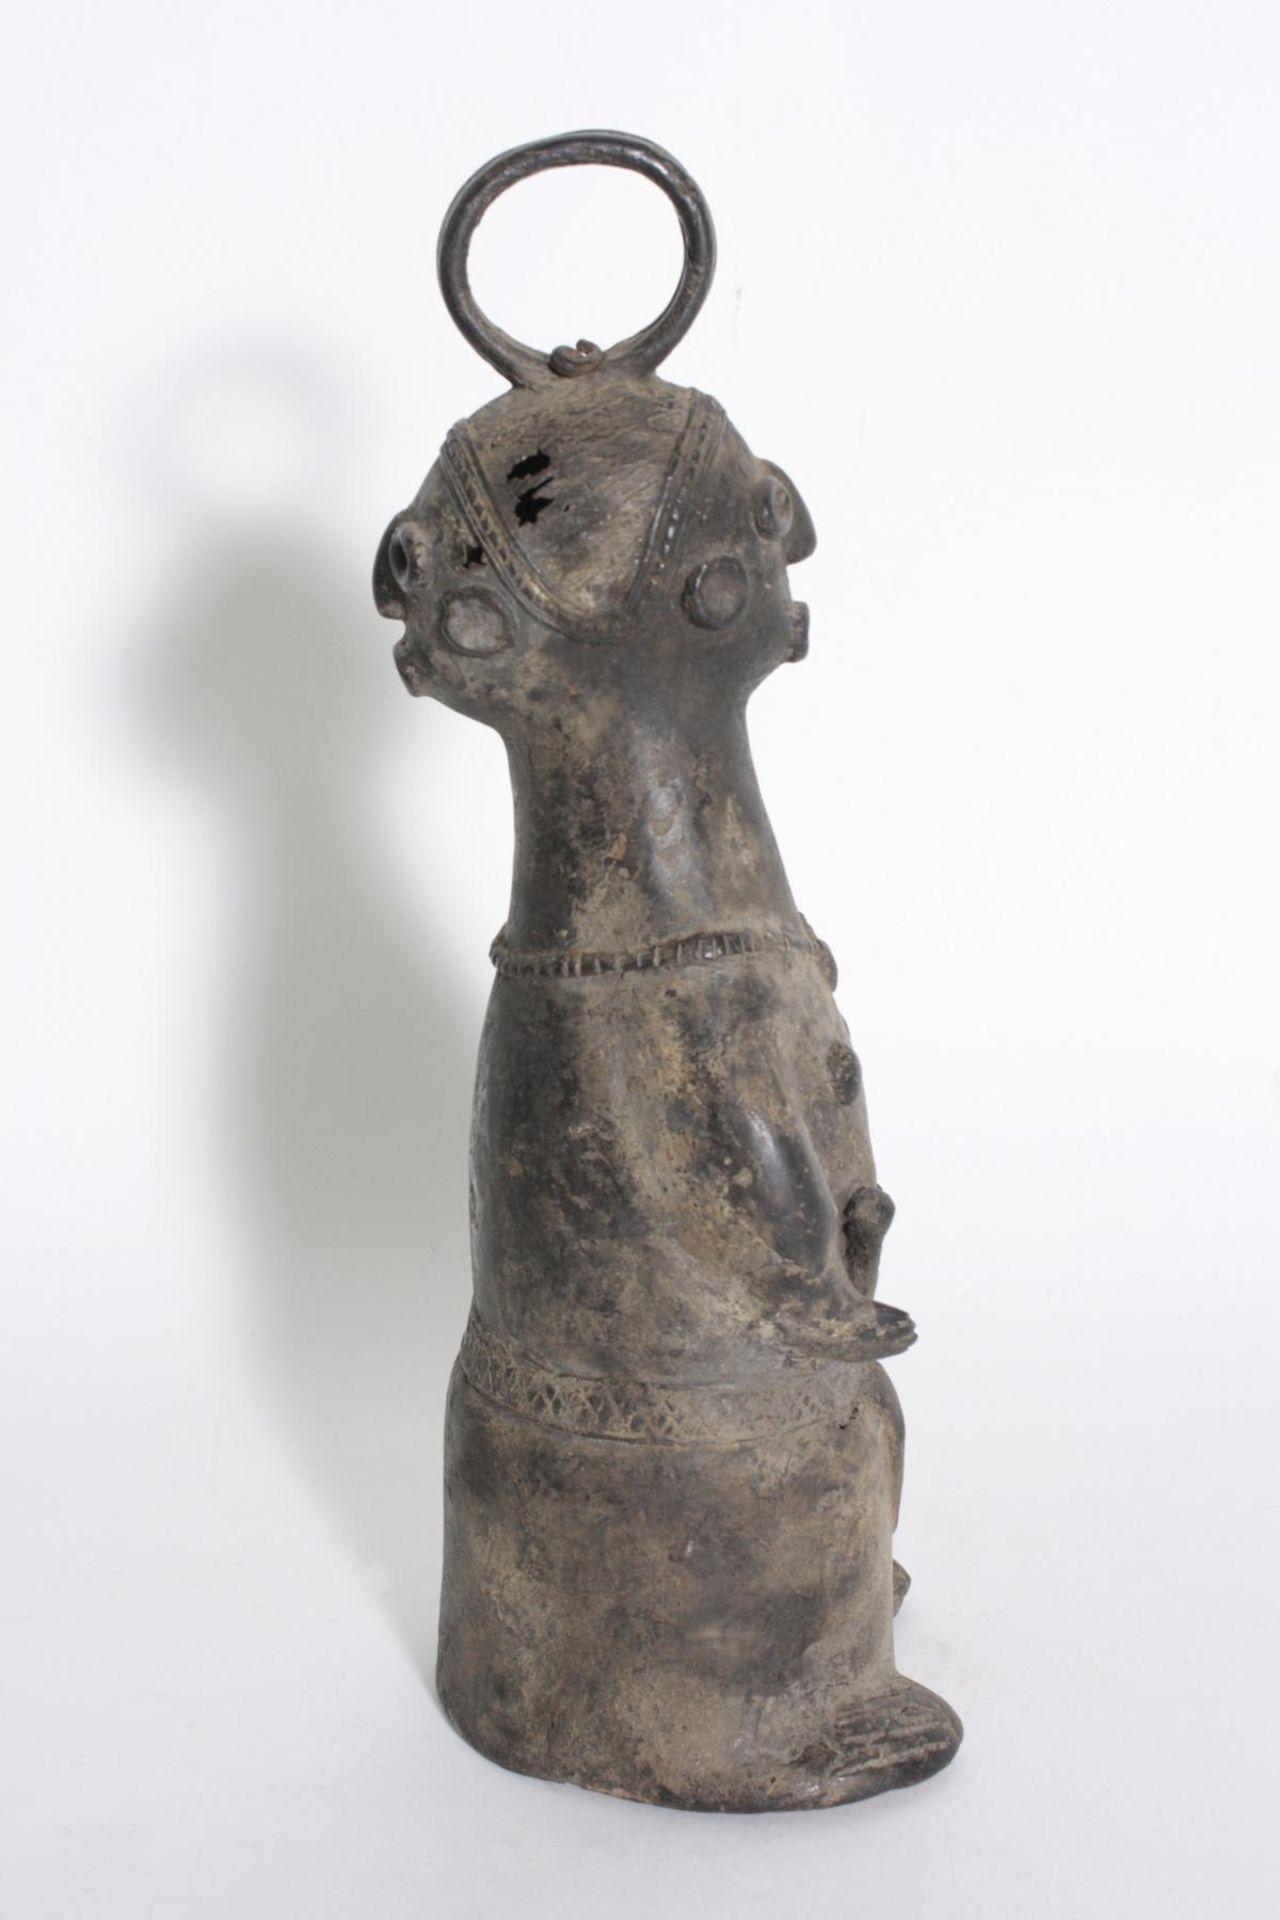 Bronze-Doppelkopf-Glocke, Benin, Nigeria, 1. Hälfte 20. Jh. - Bild 2 aus 5